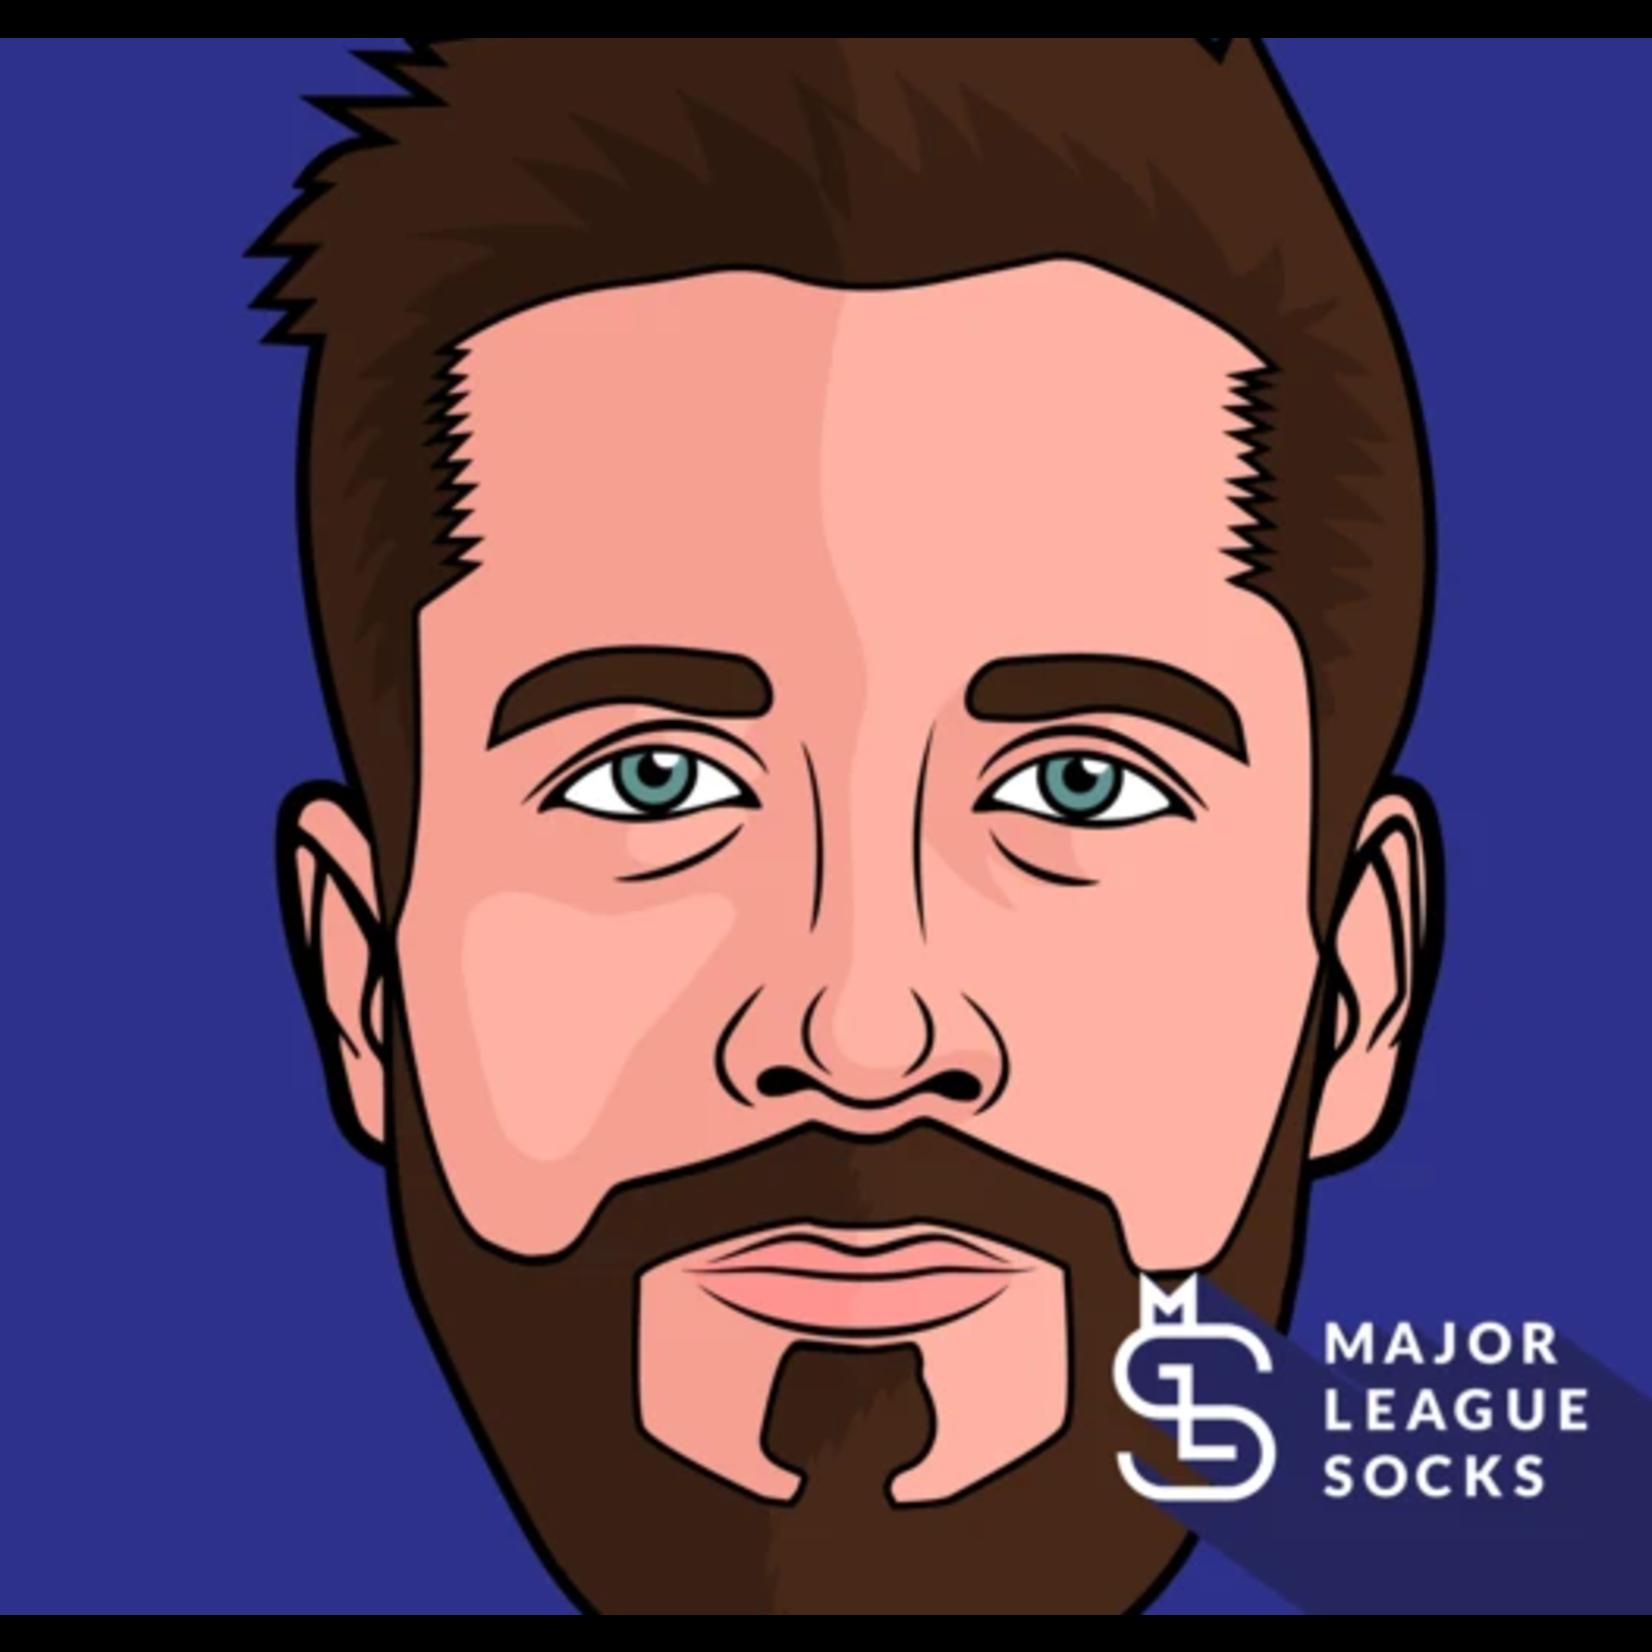 Major League Socks - Nikita Kucherov